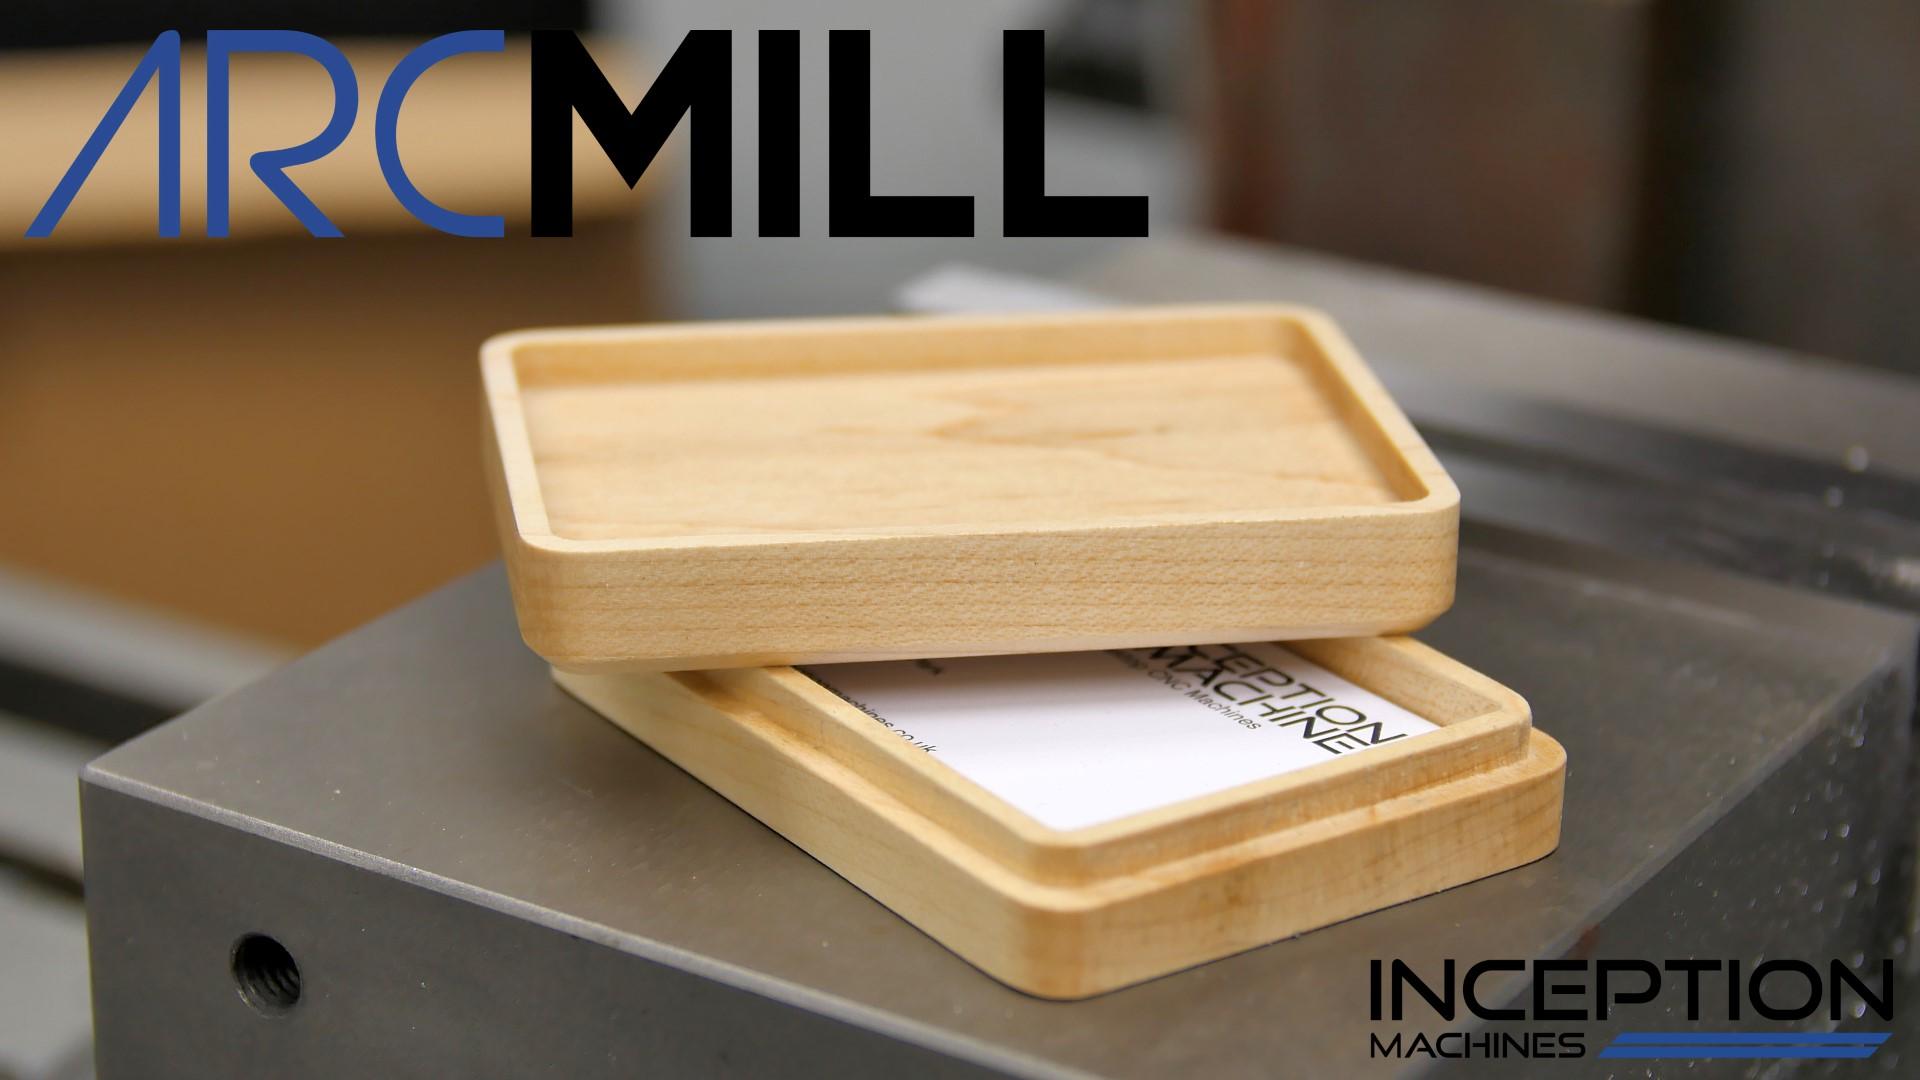 ARCMILL Demo Business Card Box Thumbnail (Large).jpg